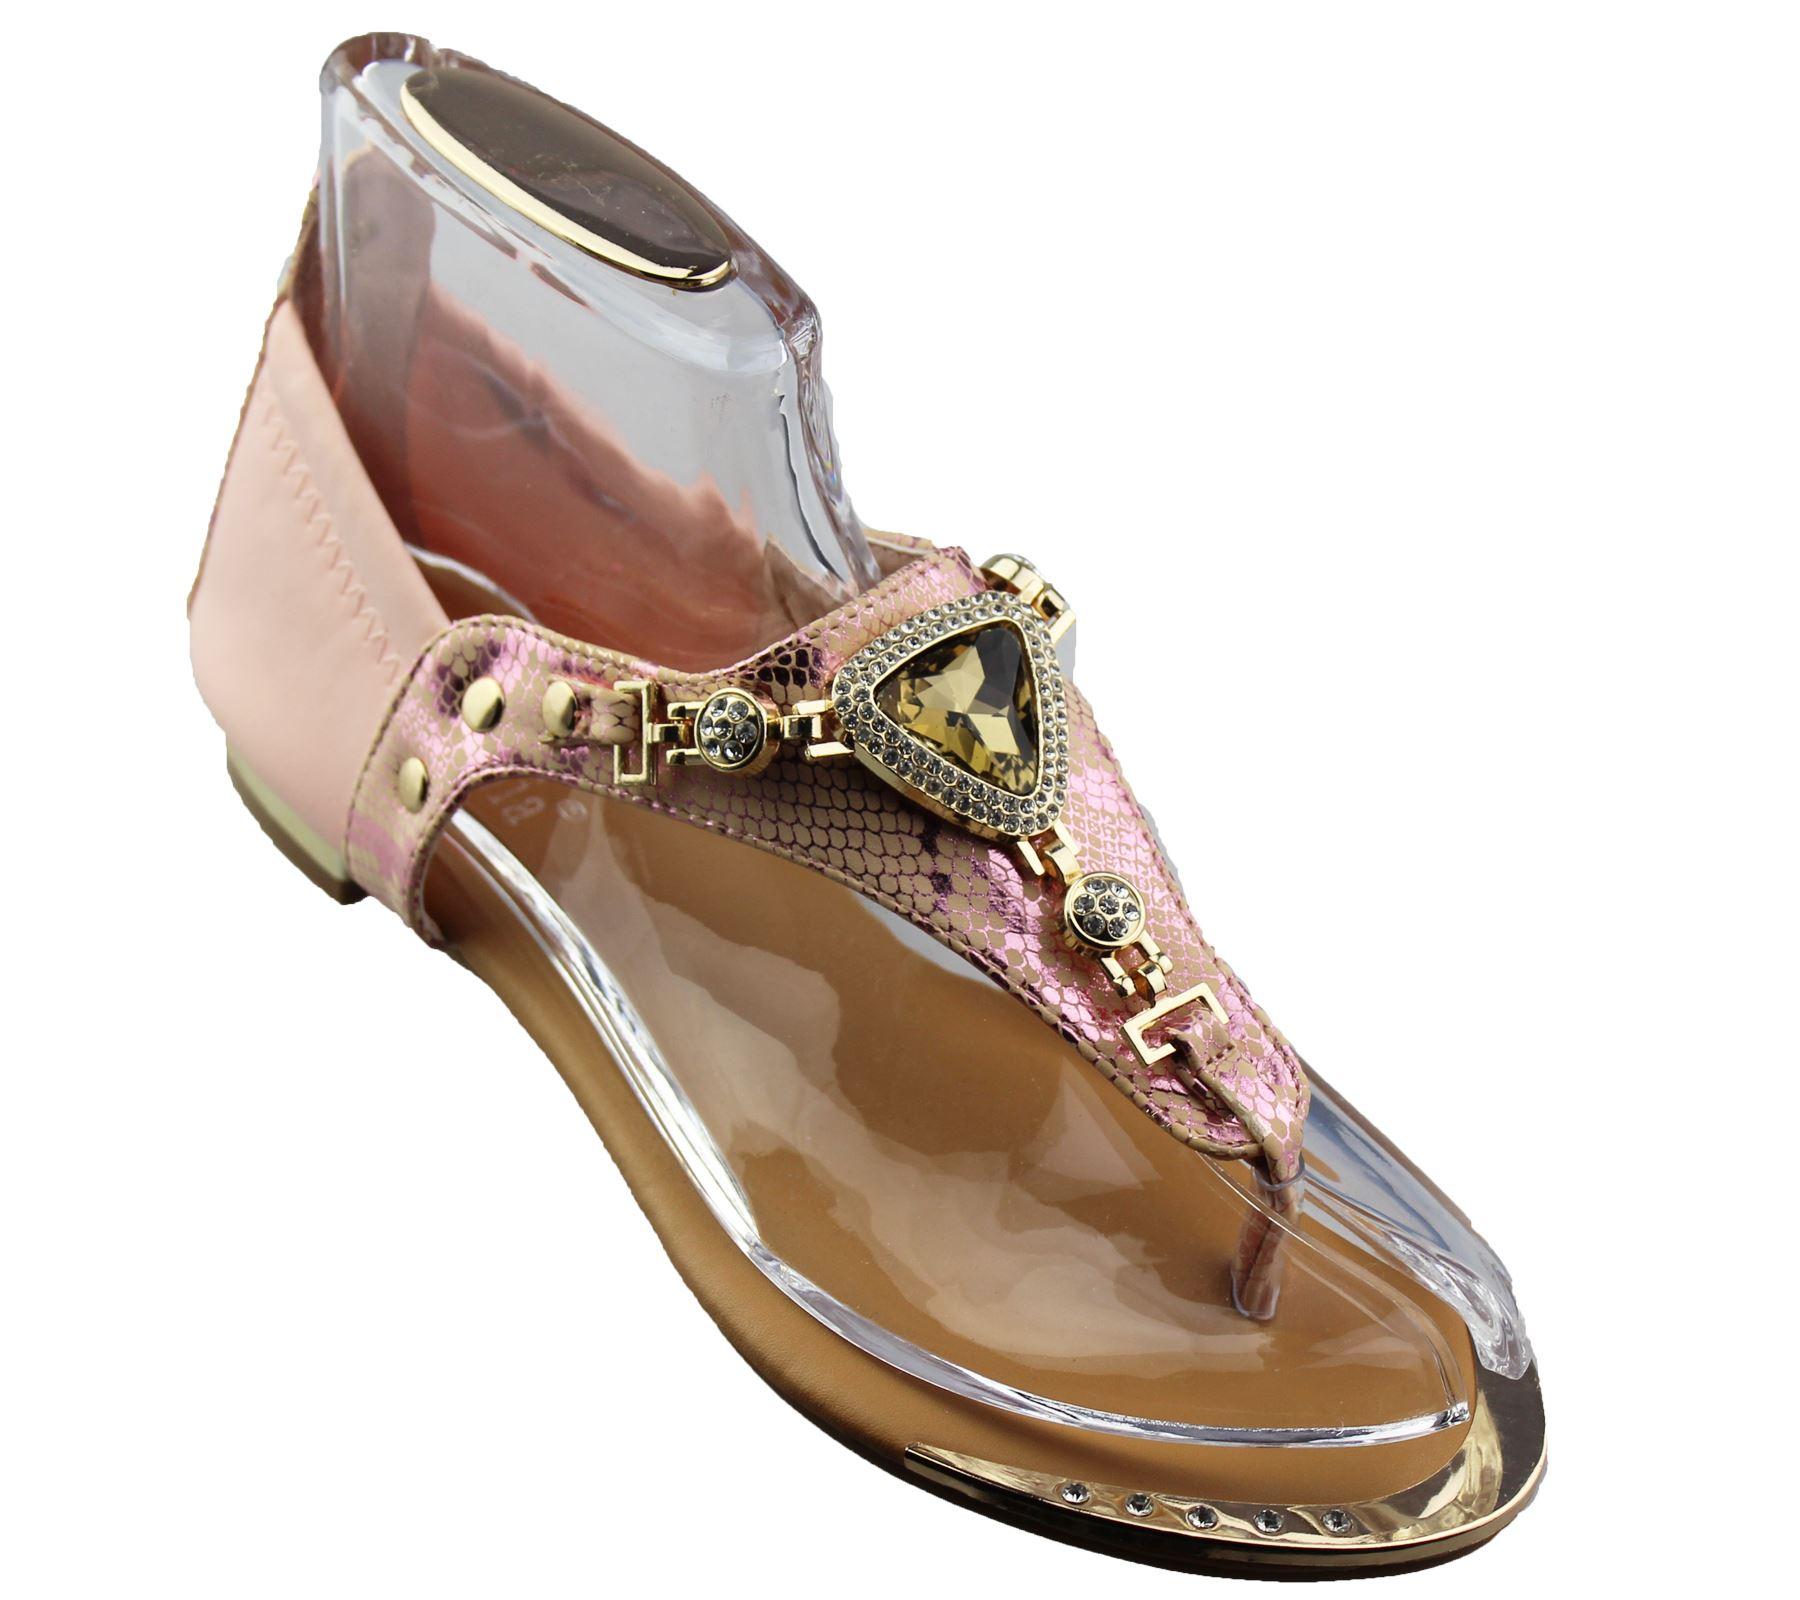 Womens-Flat-Summer-Sandals-Ladies-Diamante-Wedding-Toe-Post-Casual-Slipper thumbnail 35